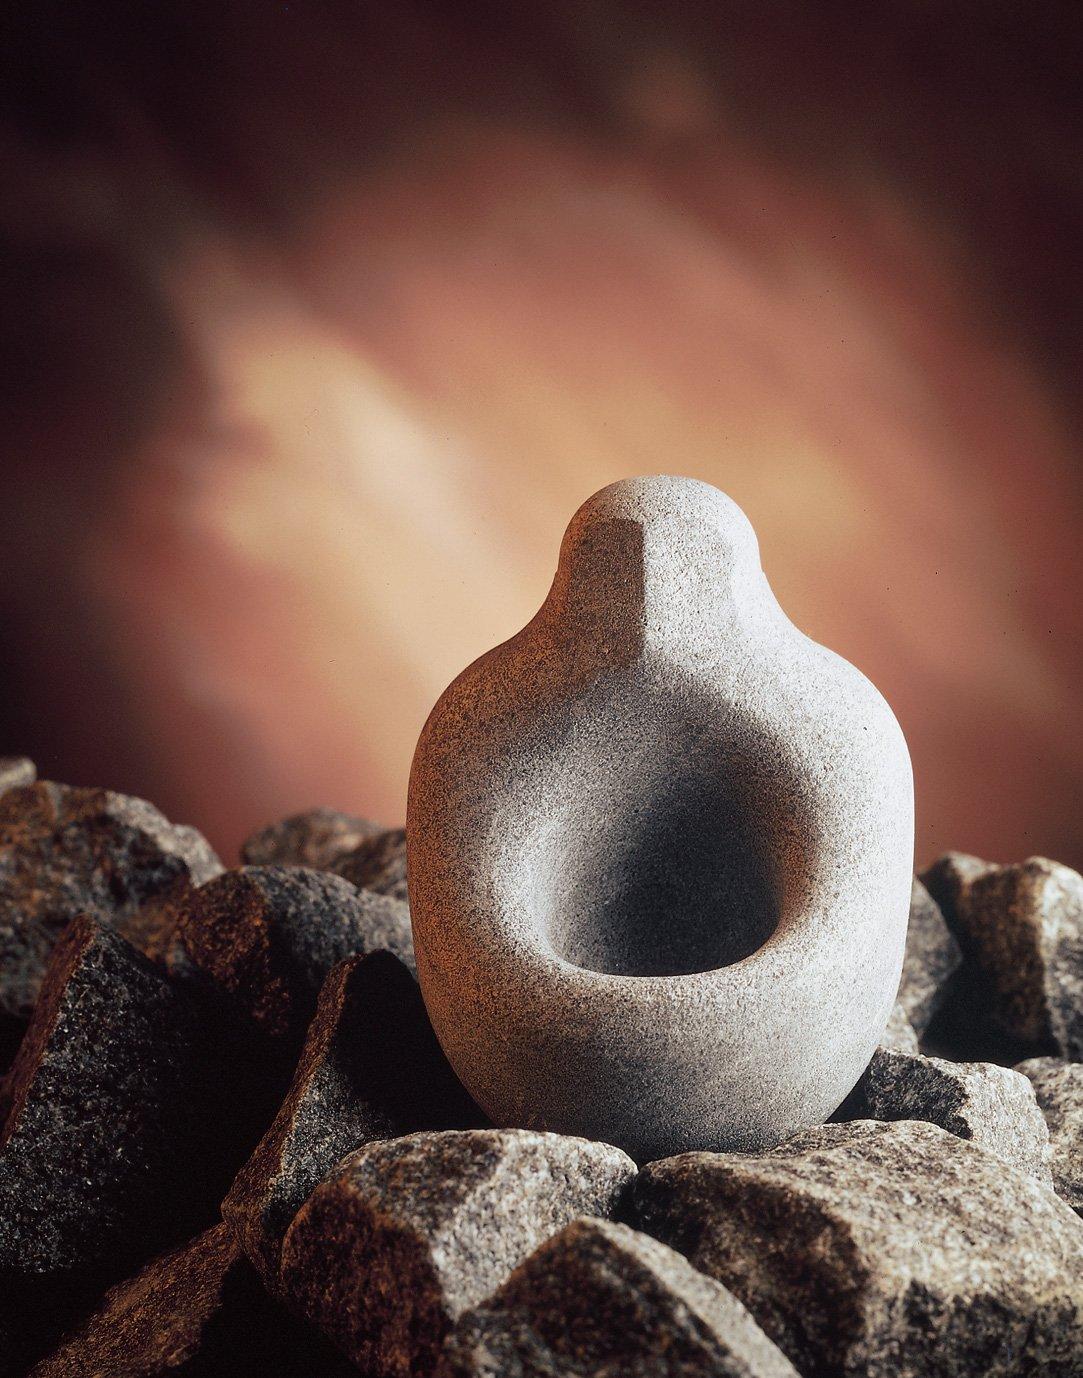 Hukka Design - Soapstone Essence Cup for the sauna oven -Lö ylynhenki- (Sauna spirit) 30 ml (Original from Finland) [11001]